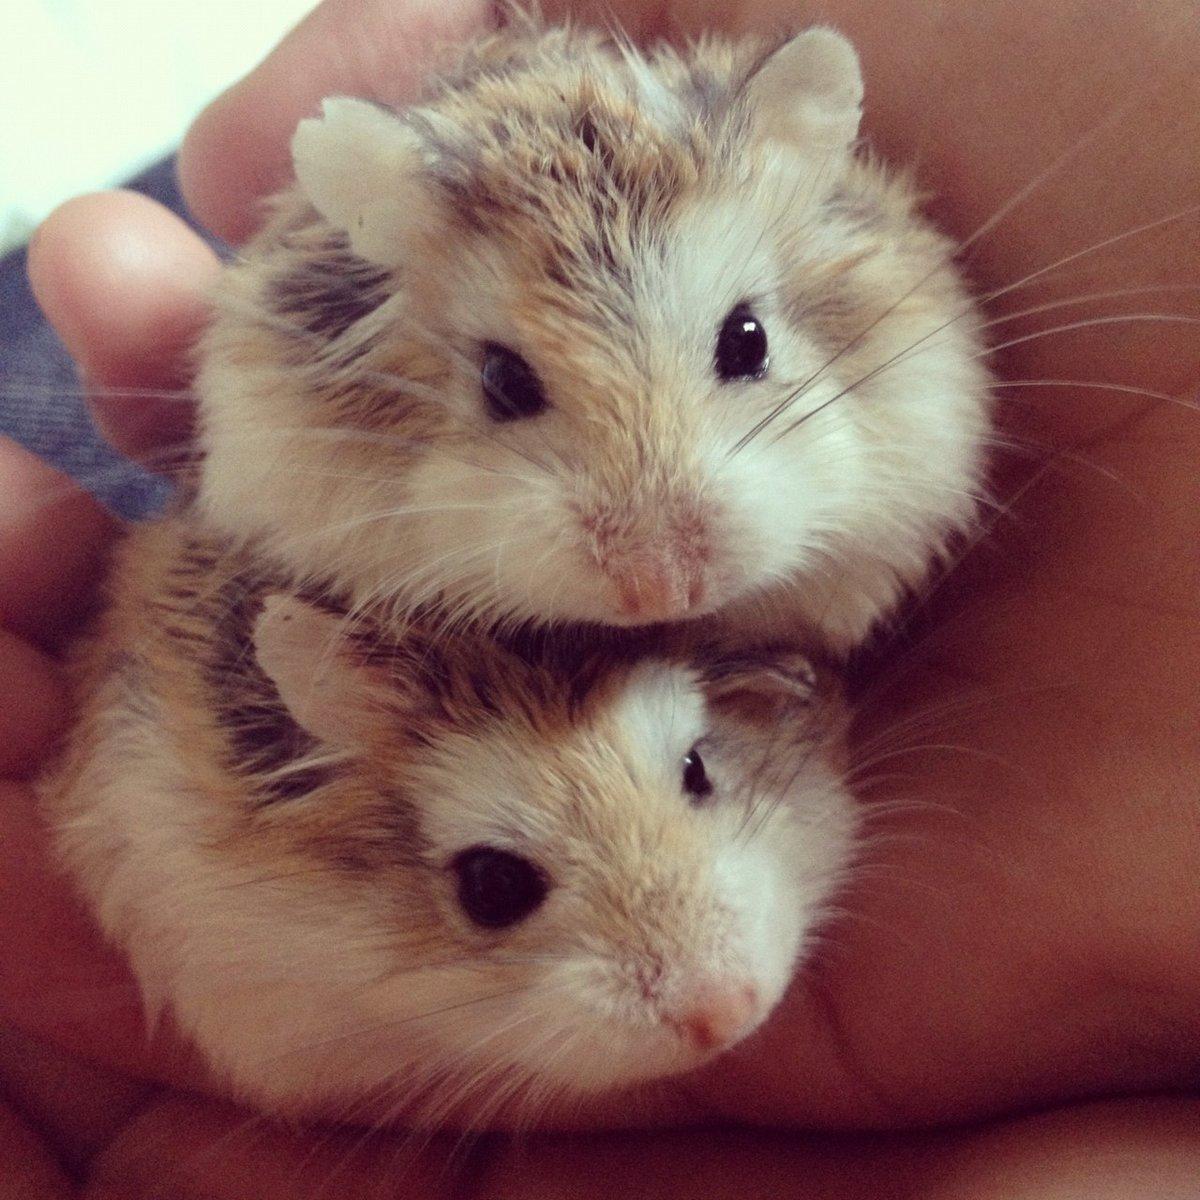 Милые картинки с хомячками